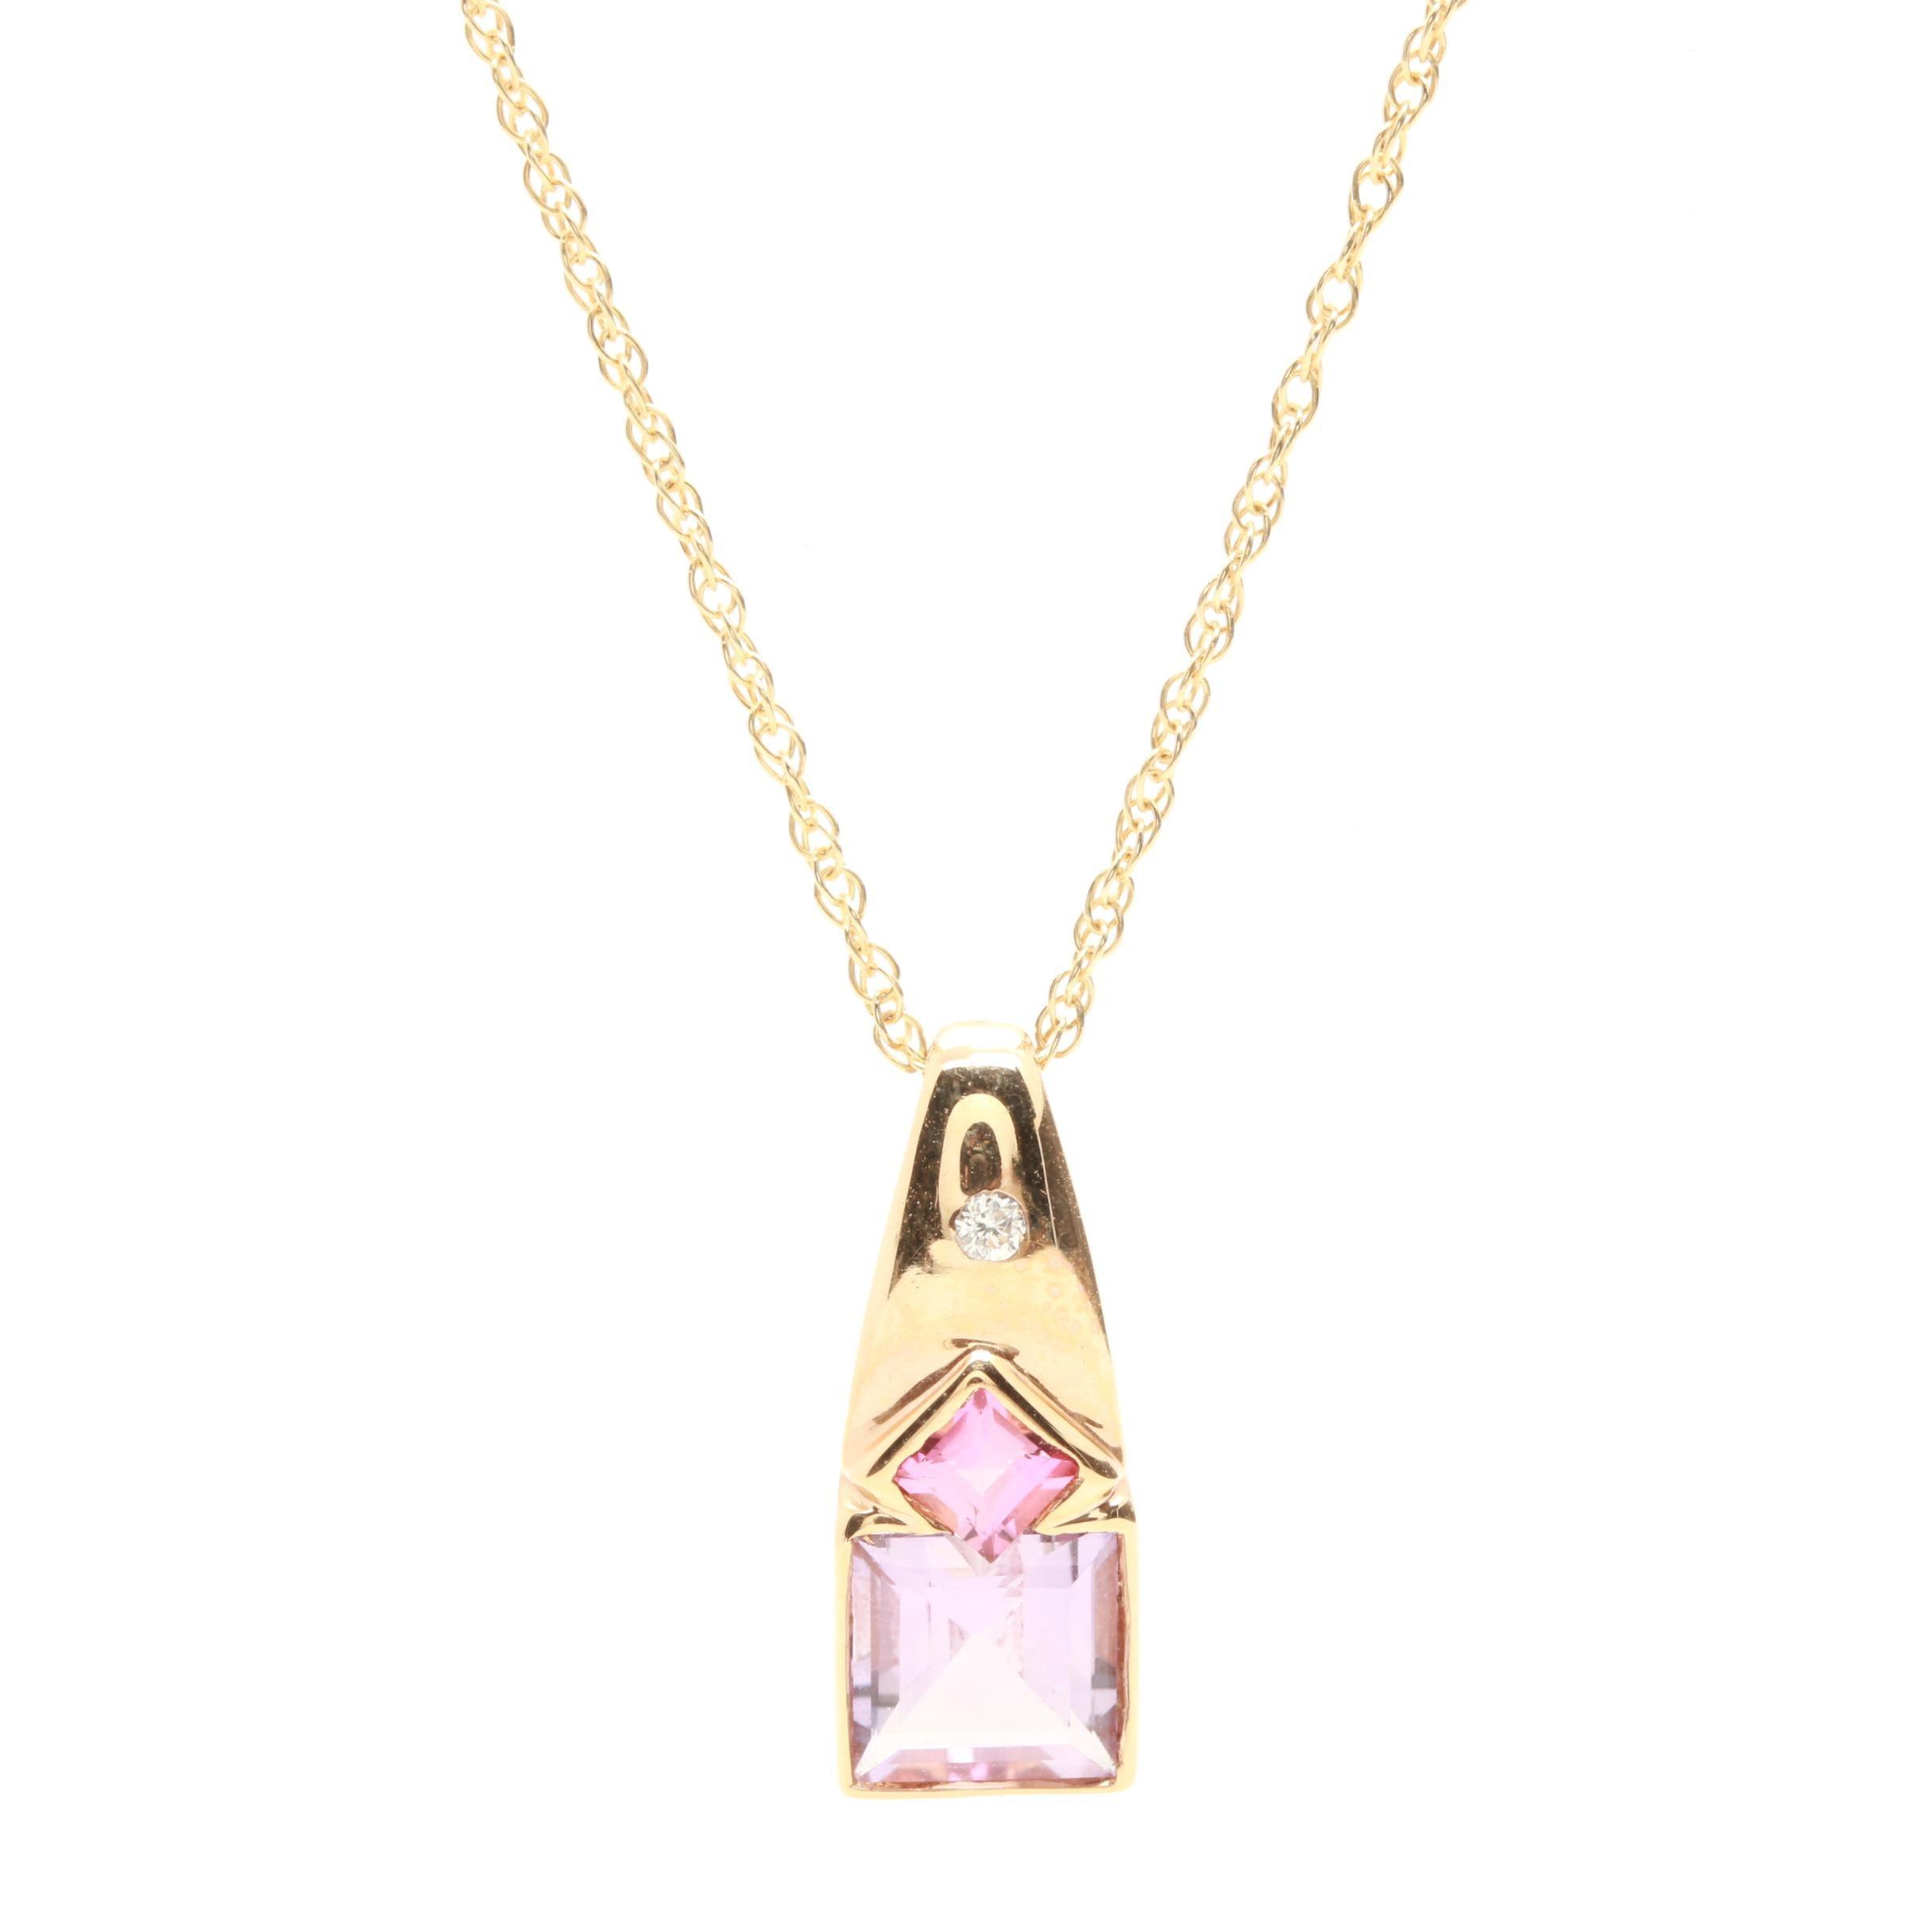 14K Yellow Gold Amethyst, Tourmaline and Diamond Necklace